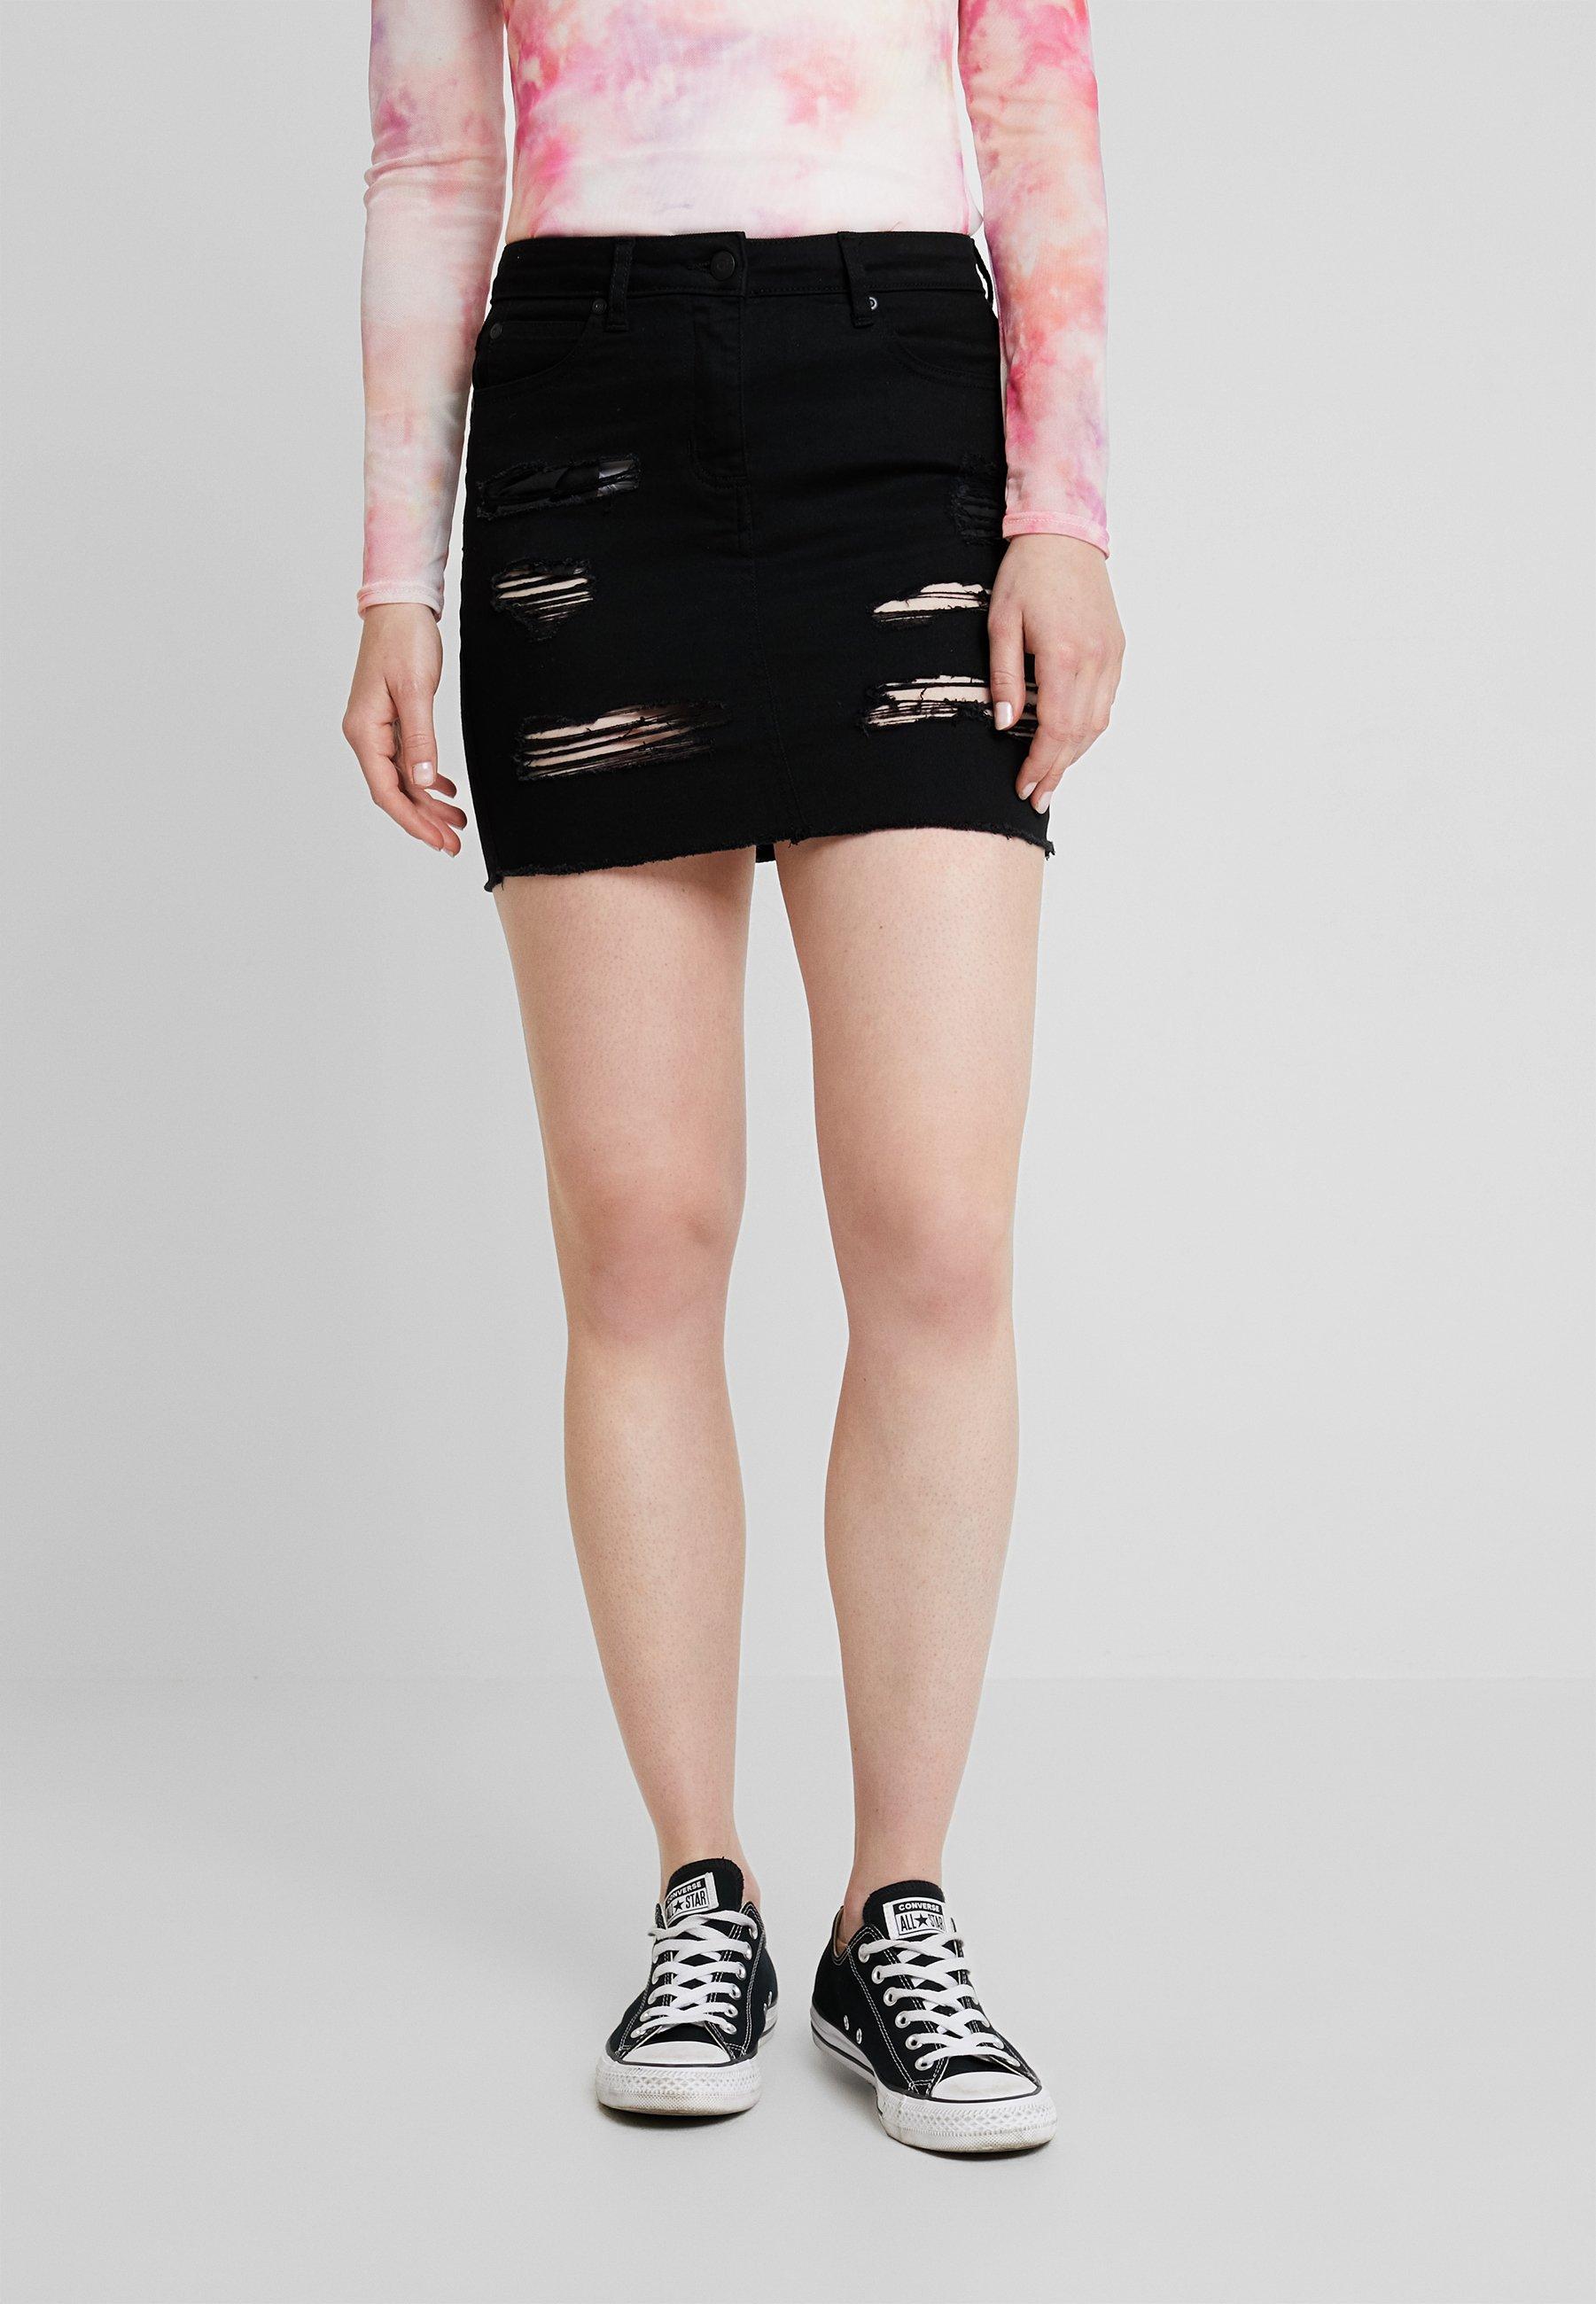 SkirtJupe New Look En Extreme Jean Black Ripped WxodCBre